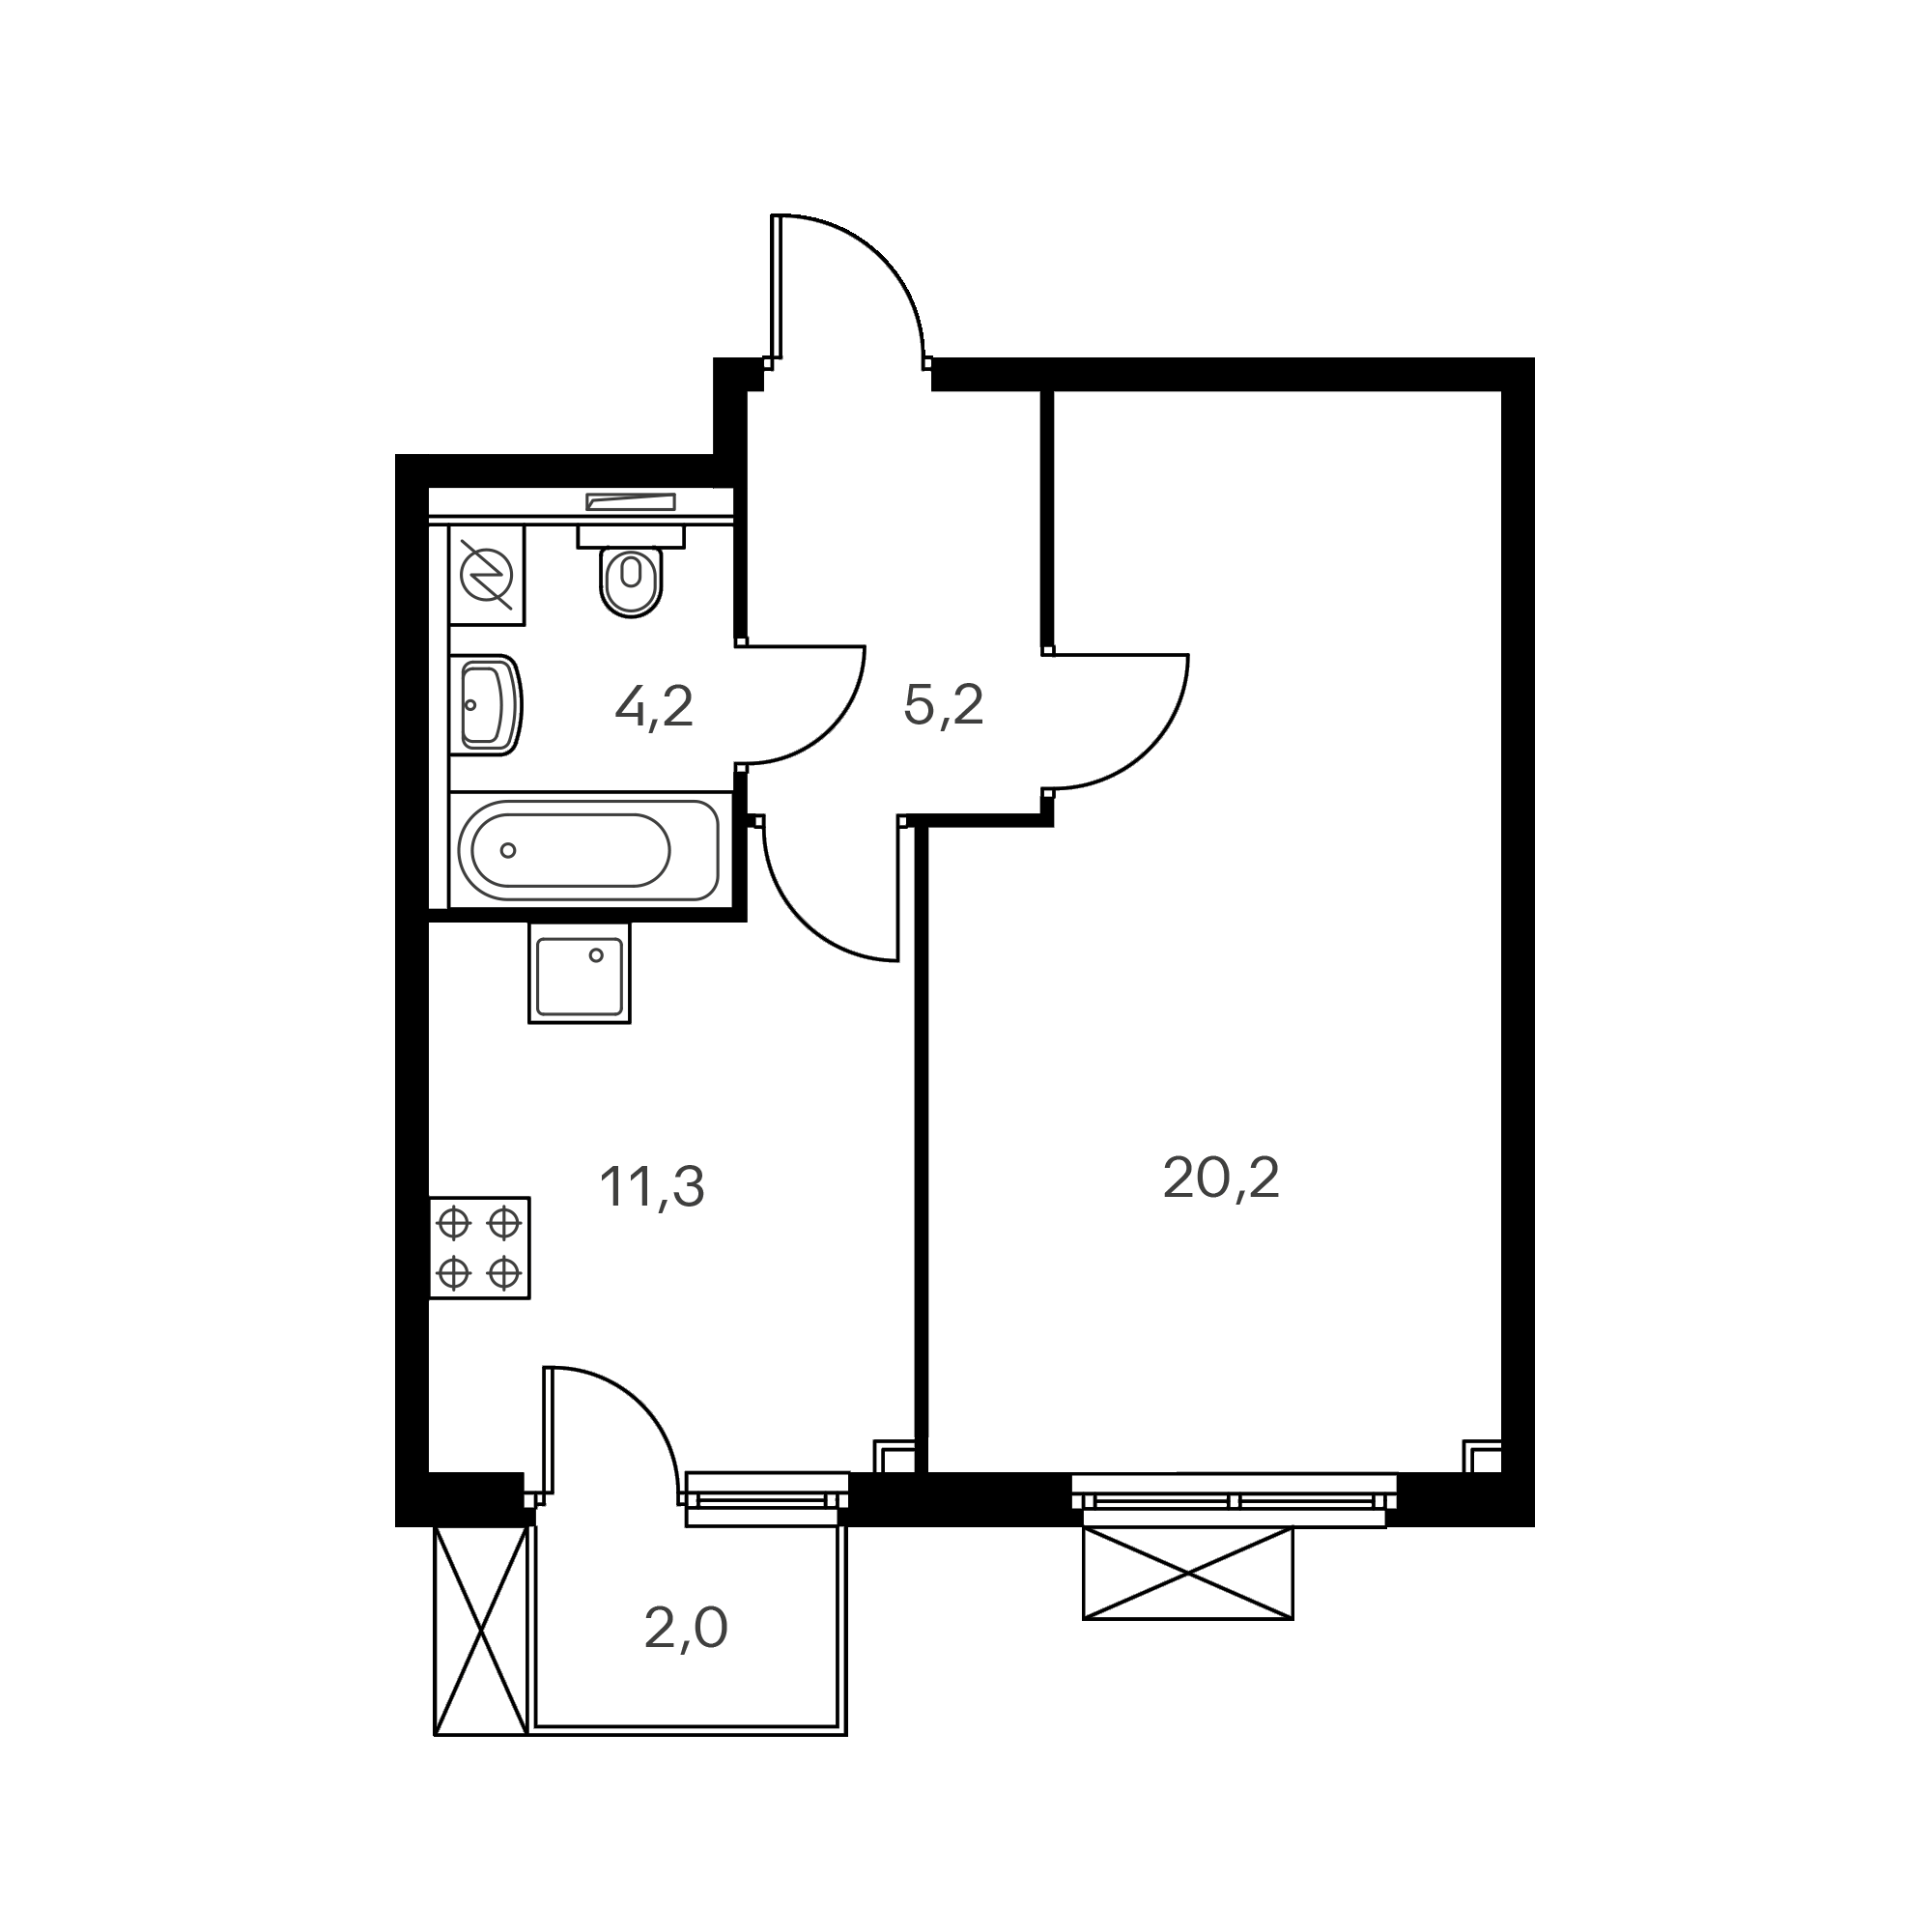 1KM1_6.9-1_B(K-2,0)